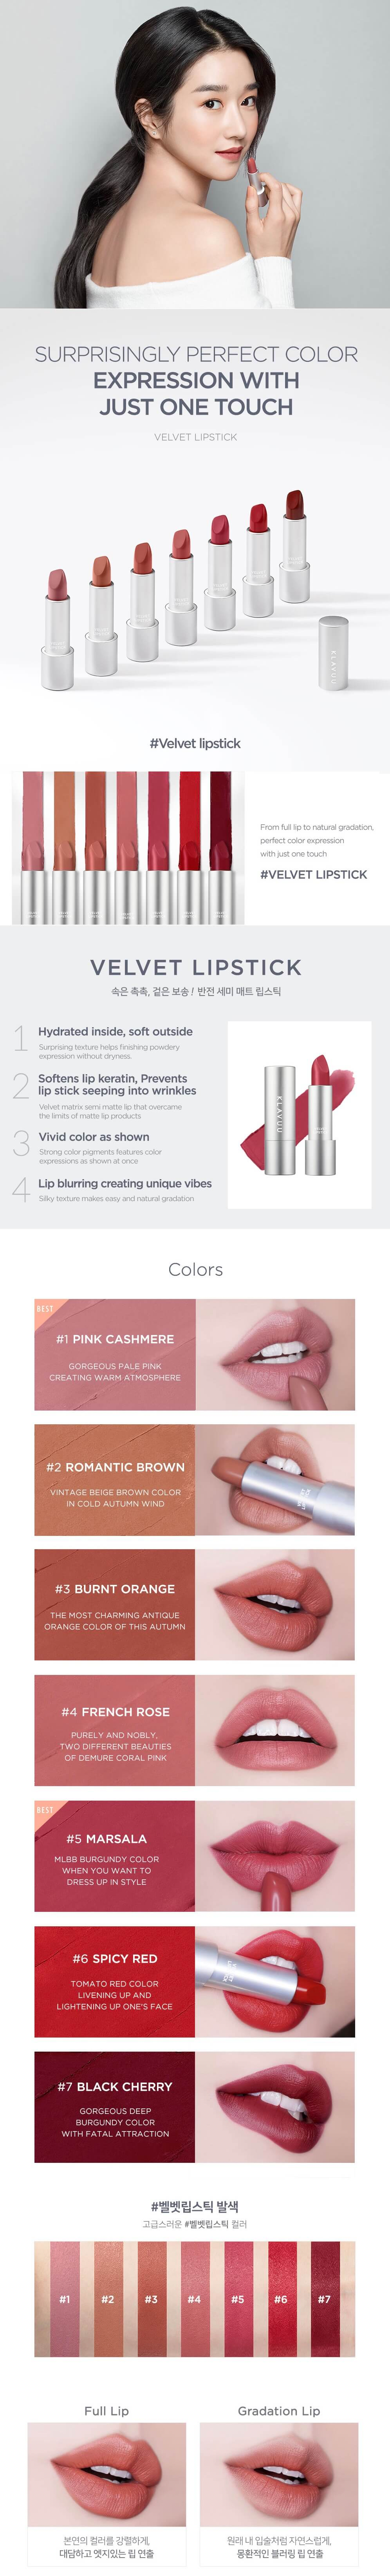 Klavuu Urban Pearlsation Velvet Lipstick 3.5g